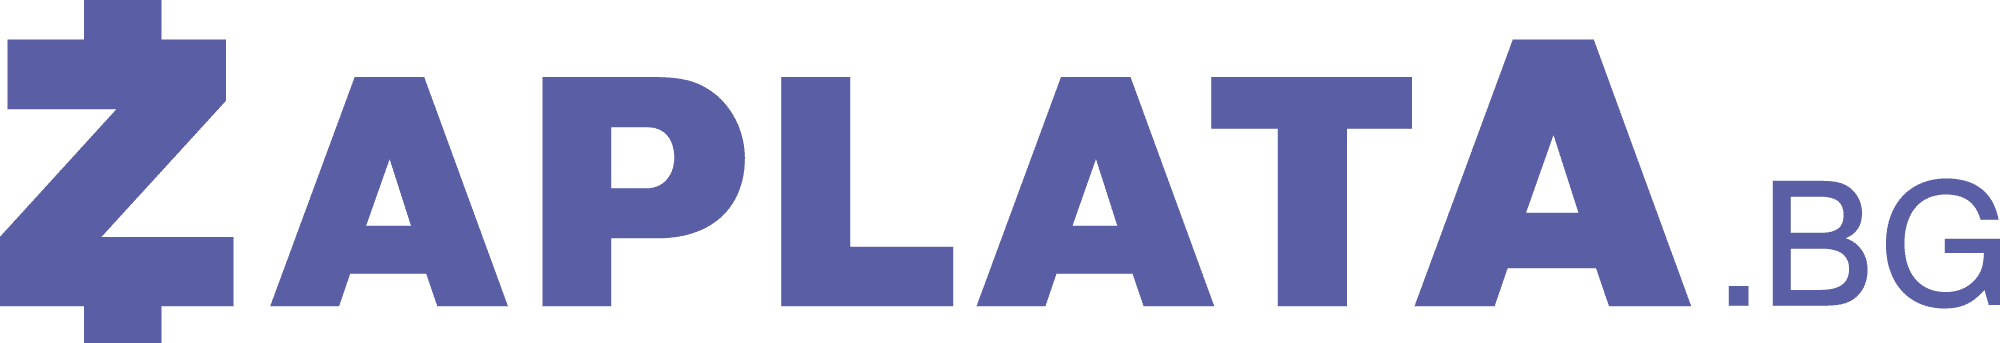 GMedia Facebook Ads Marketing Zaplata.bg Zaplata Client Job Search Job Platform